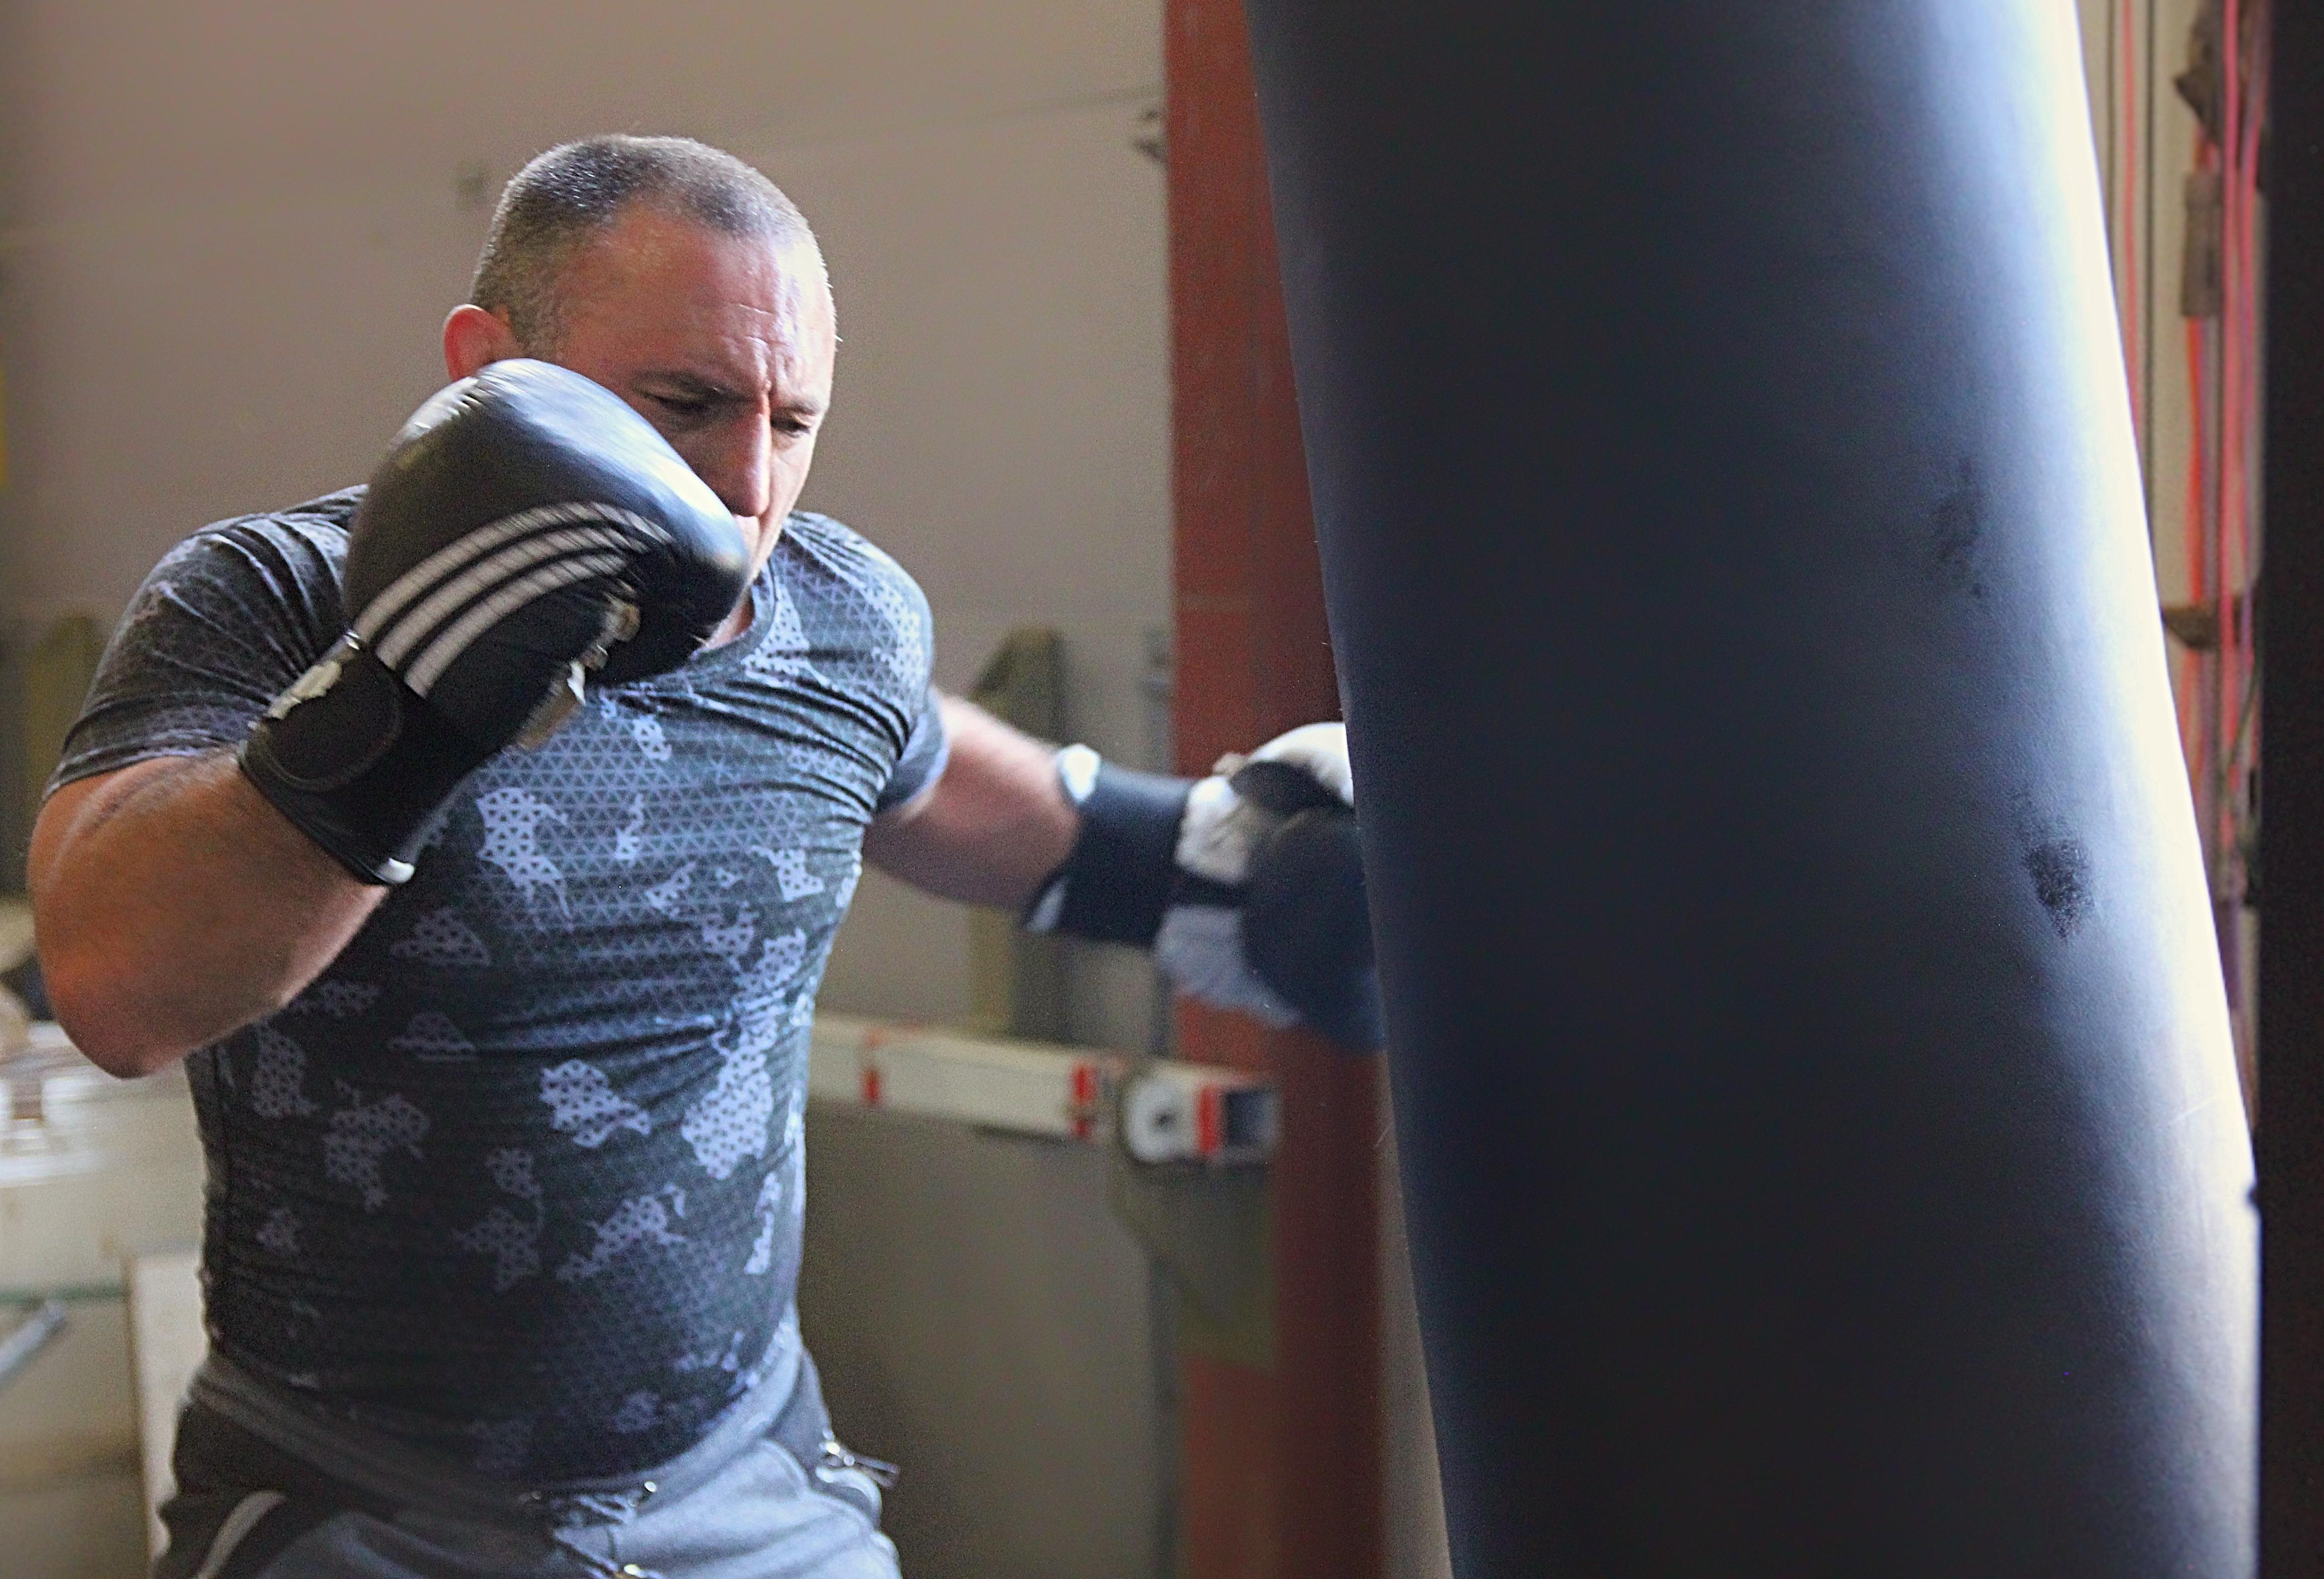 Mihai Boxing